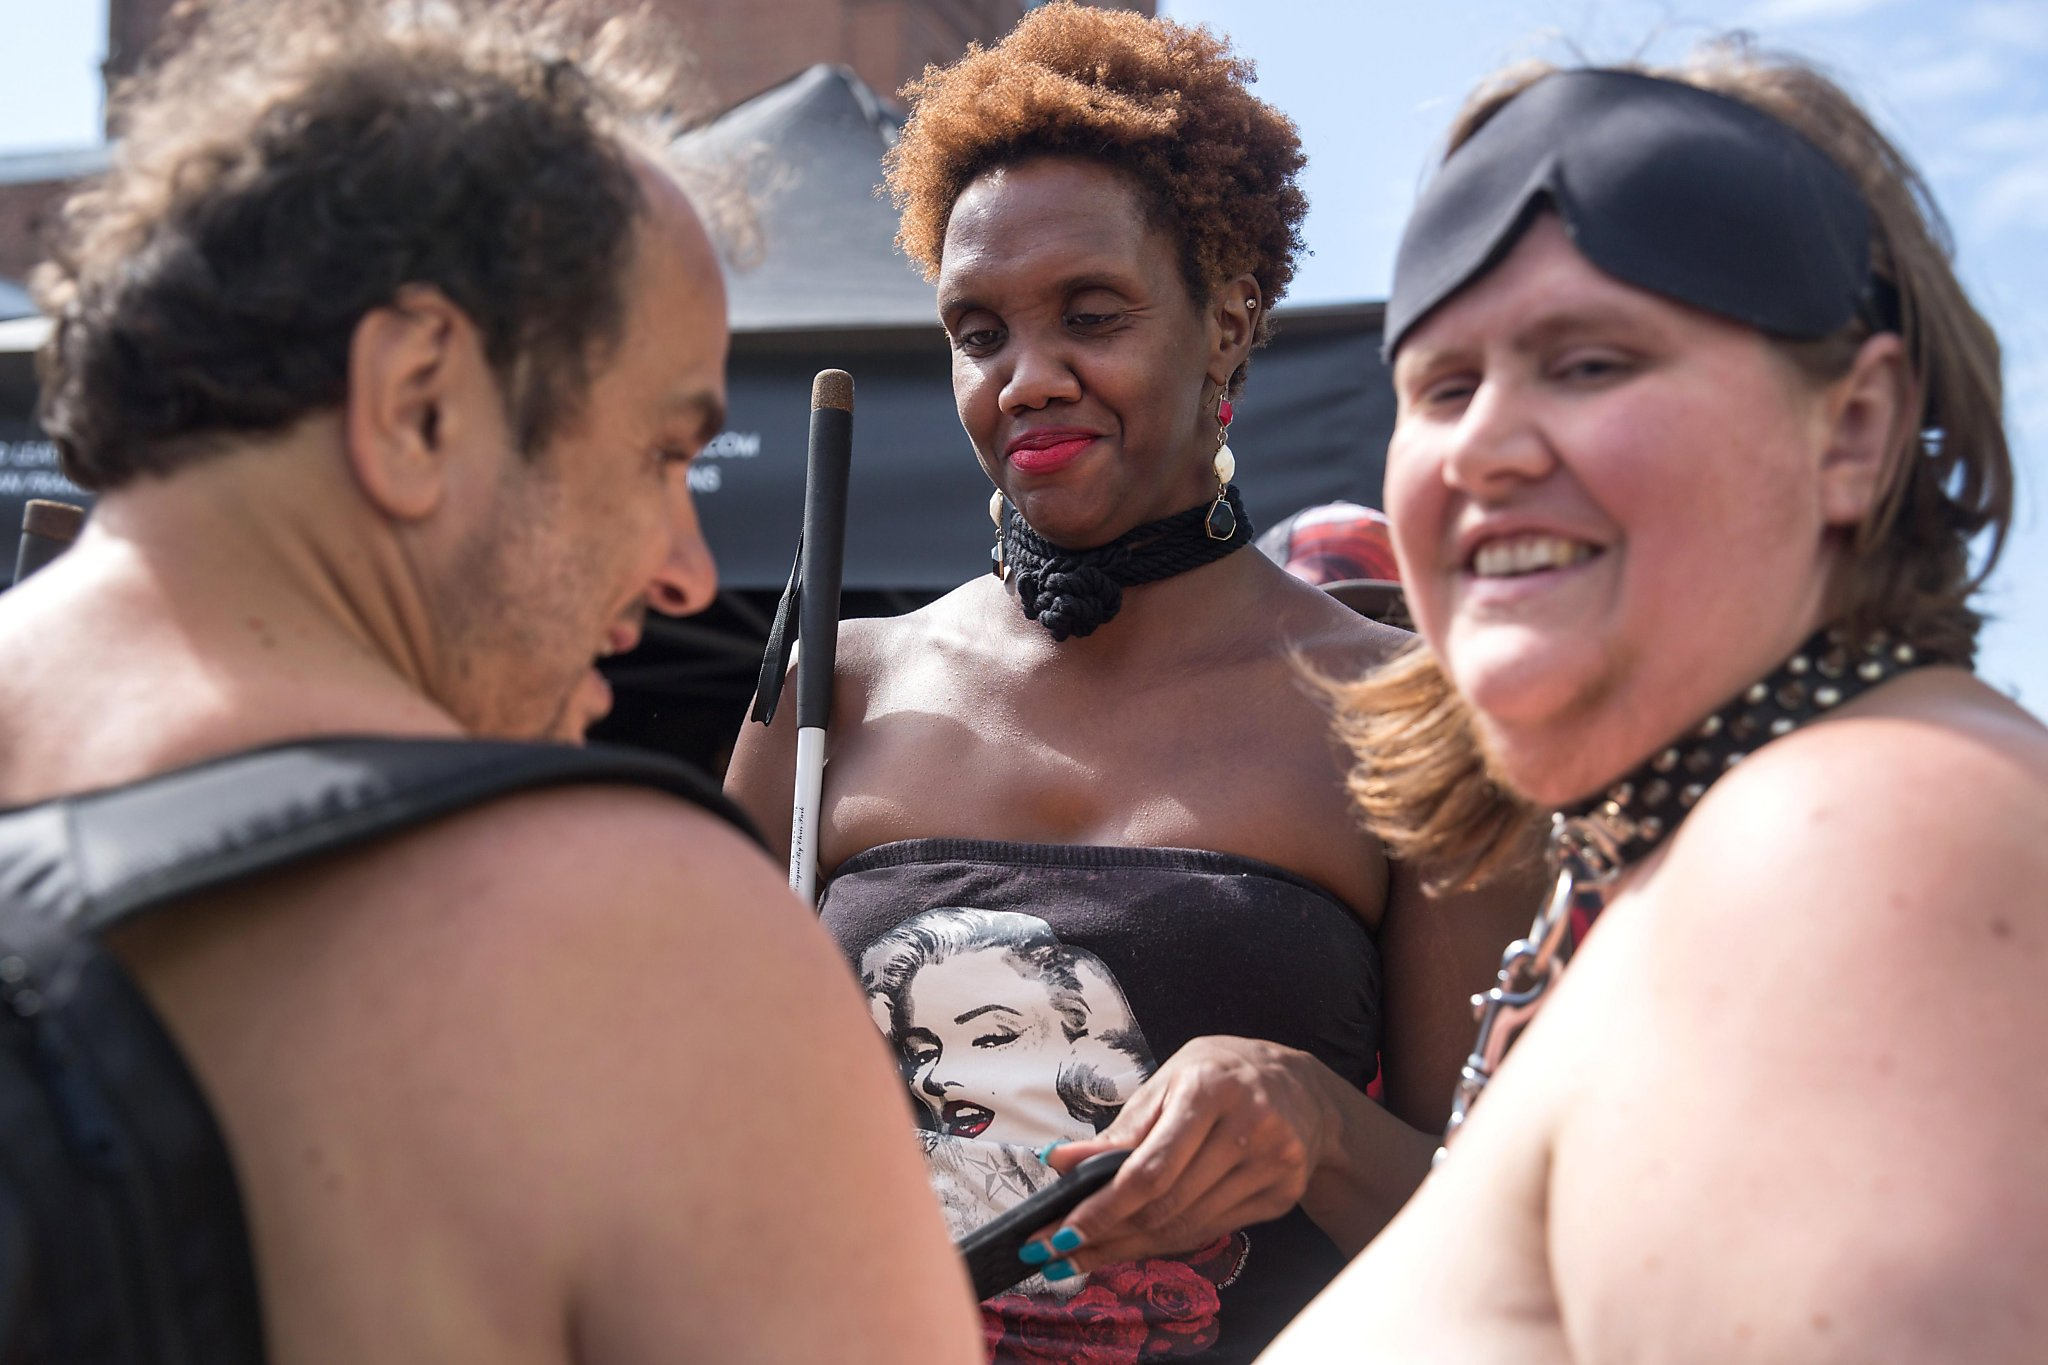 Throngs in thongs: SF gets kinky at Folsom Street Fair